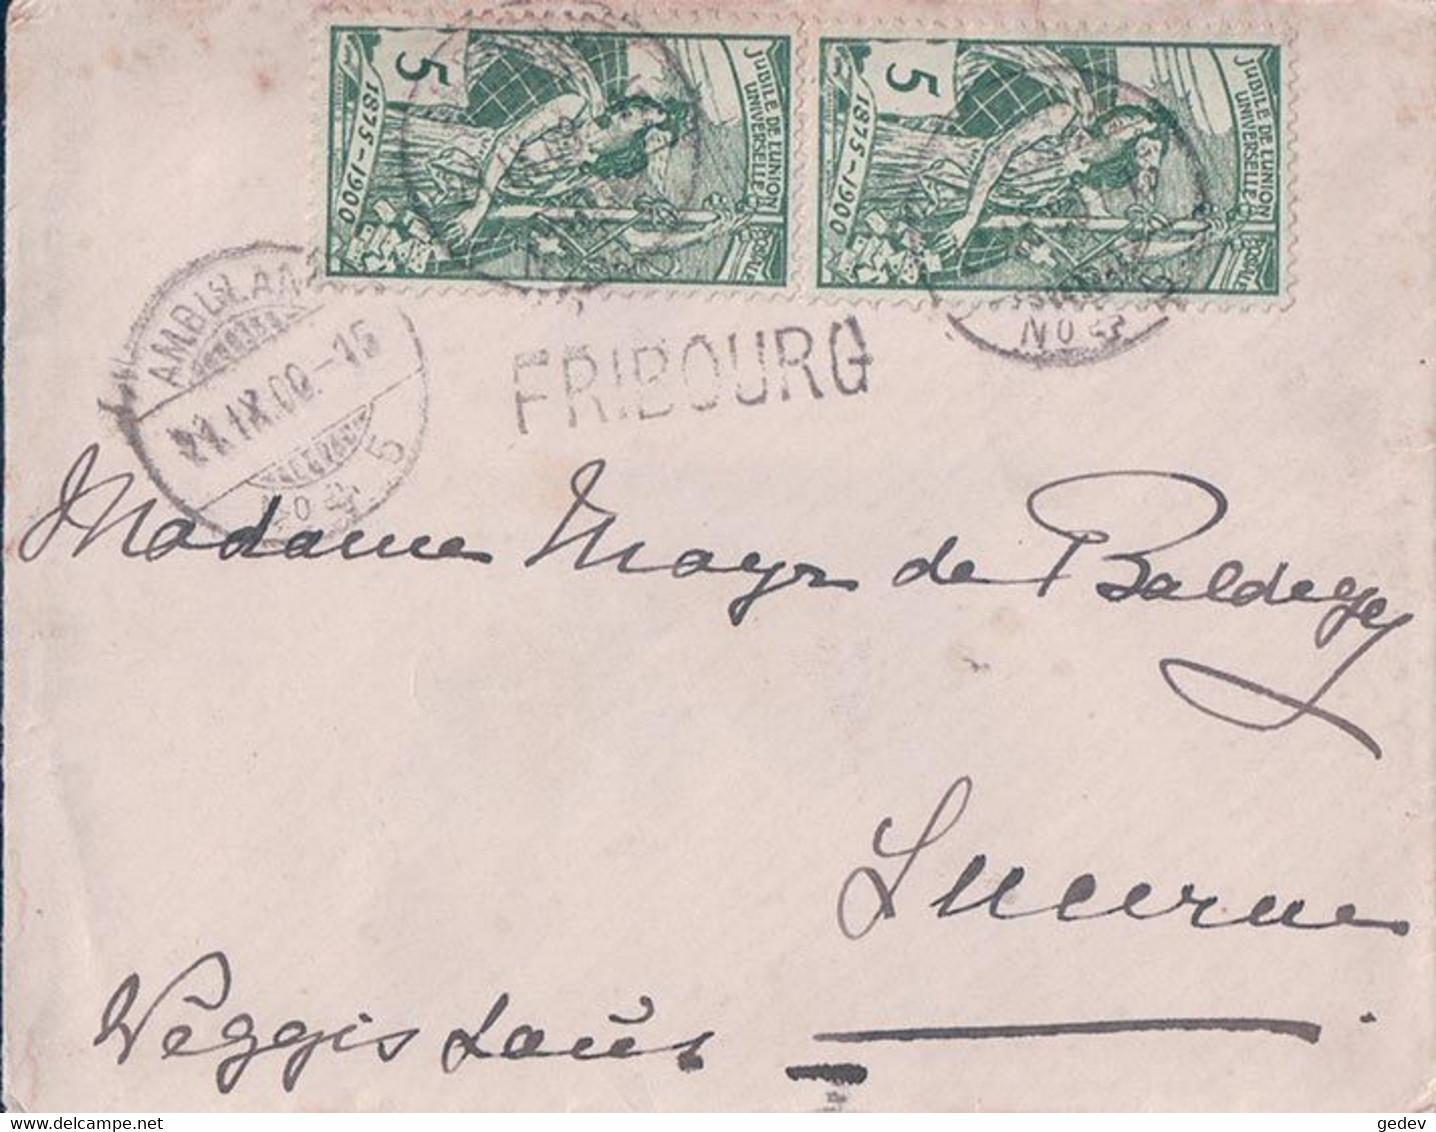 Suisse Petite Lettre Timbres UPU 5 Ct, Fribourg - Lucerne, Cachet Linéaire FRIBOURG (21.9.1900) 9x12 - Covers & Documents